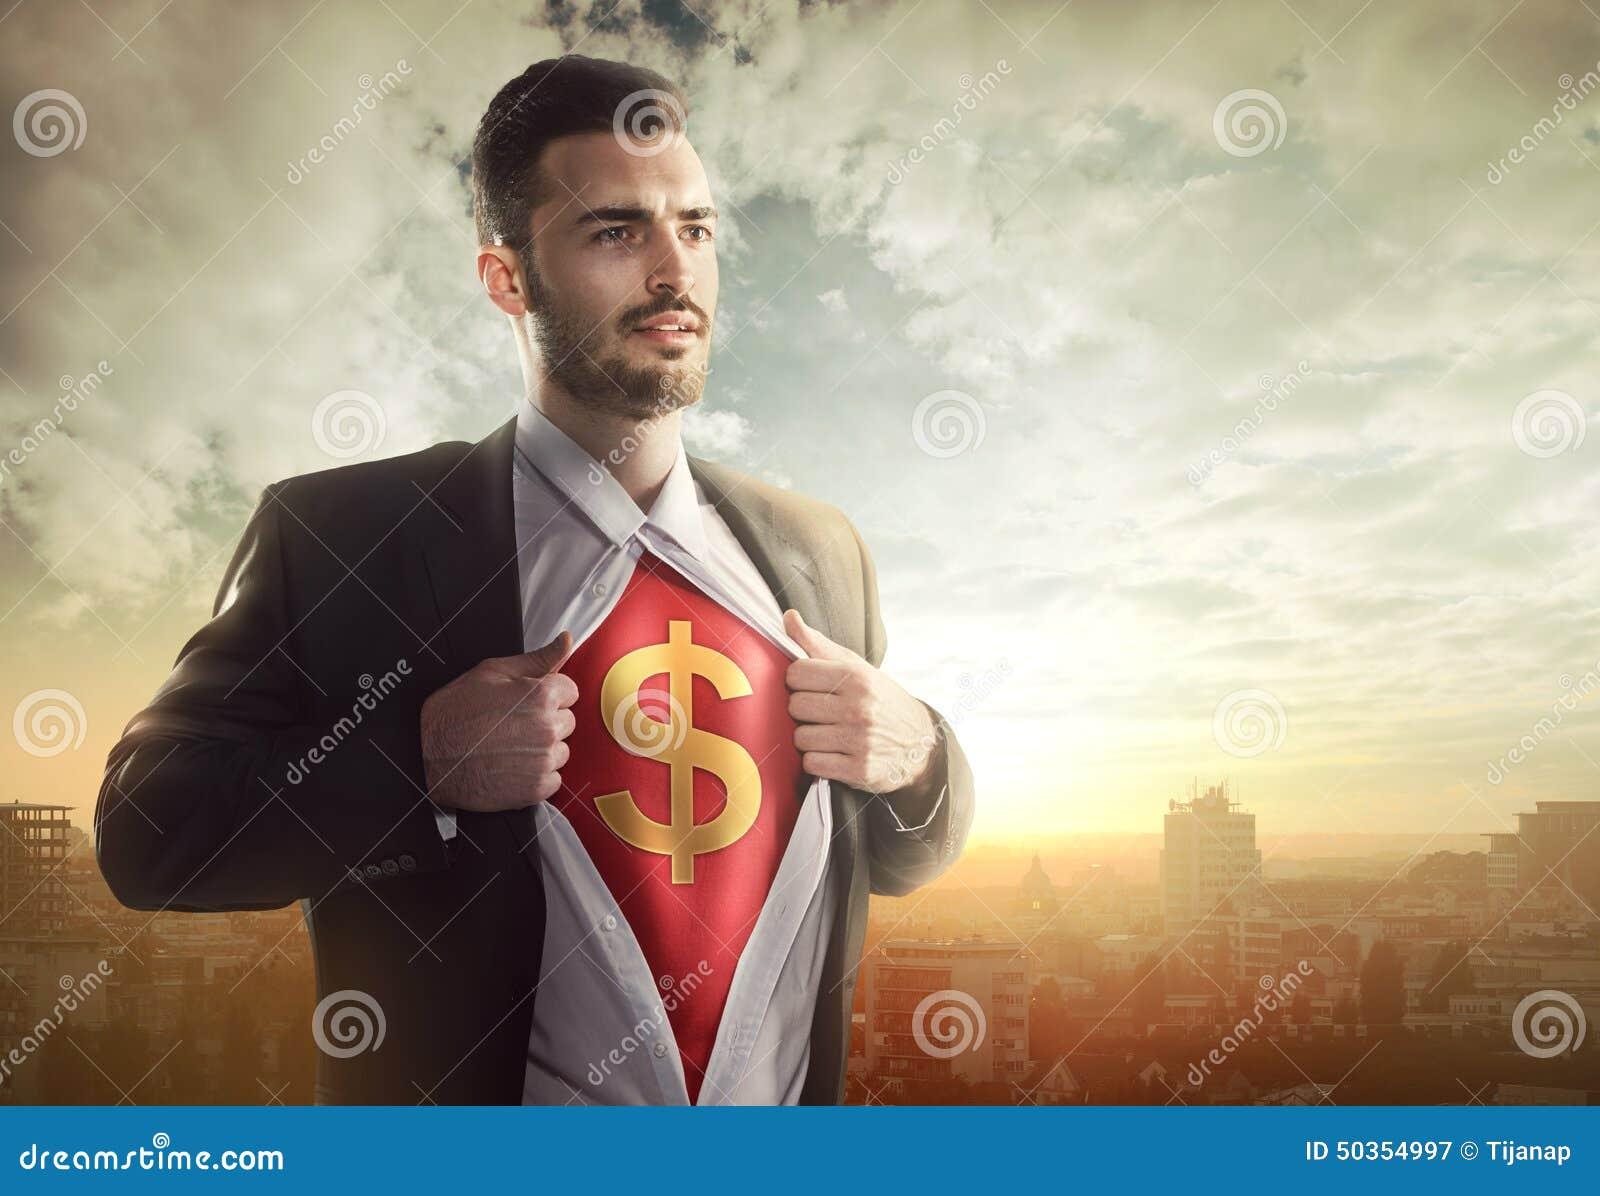 Businessman with dollar sign as superhero